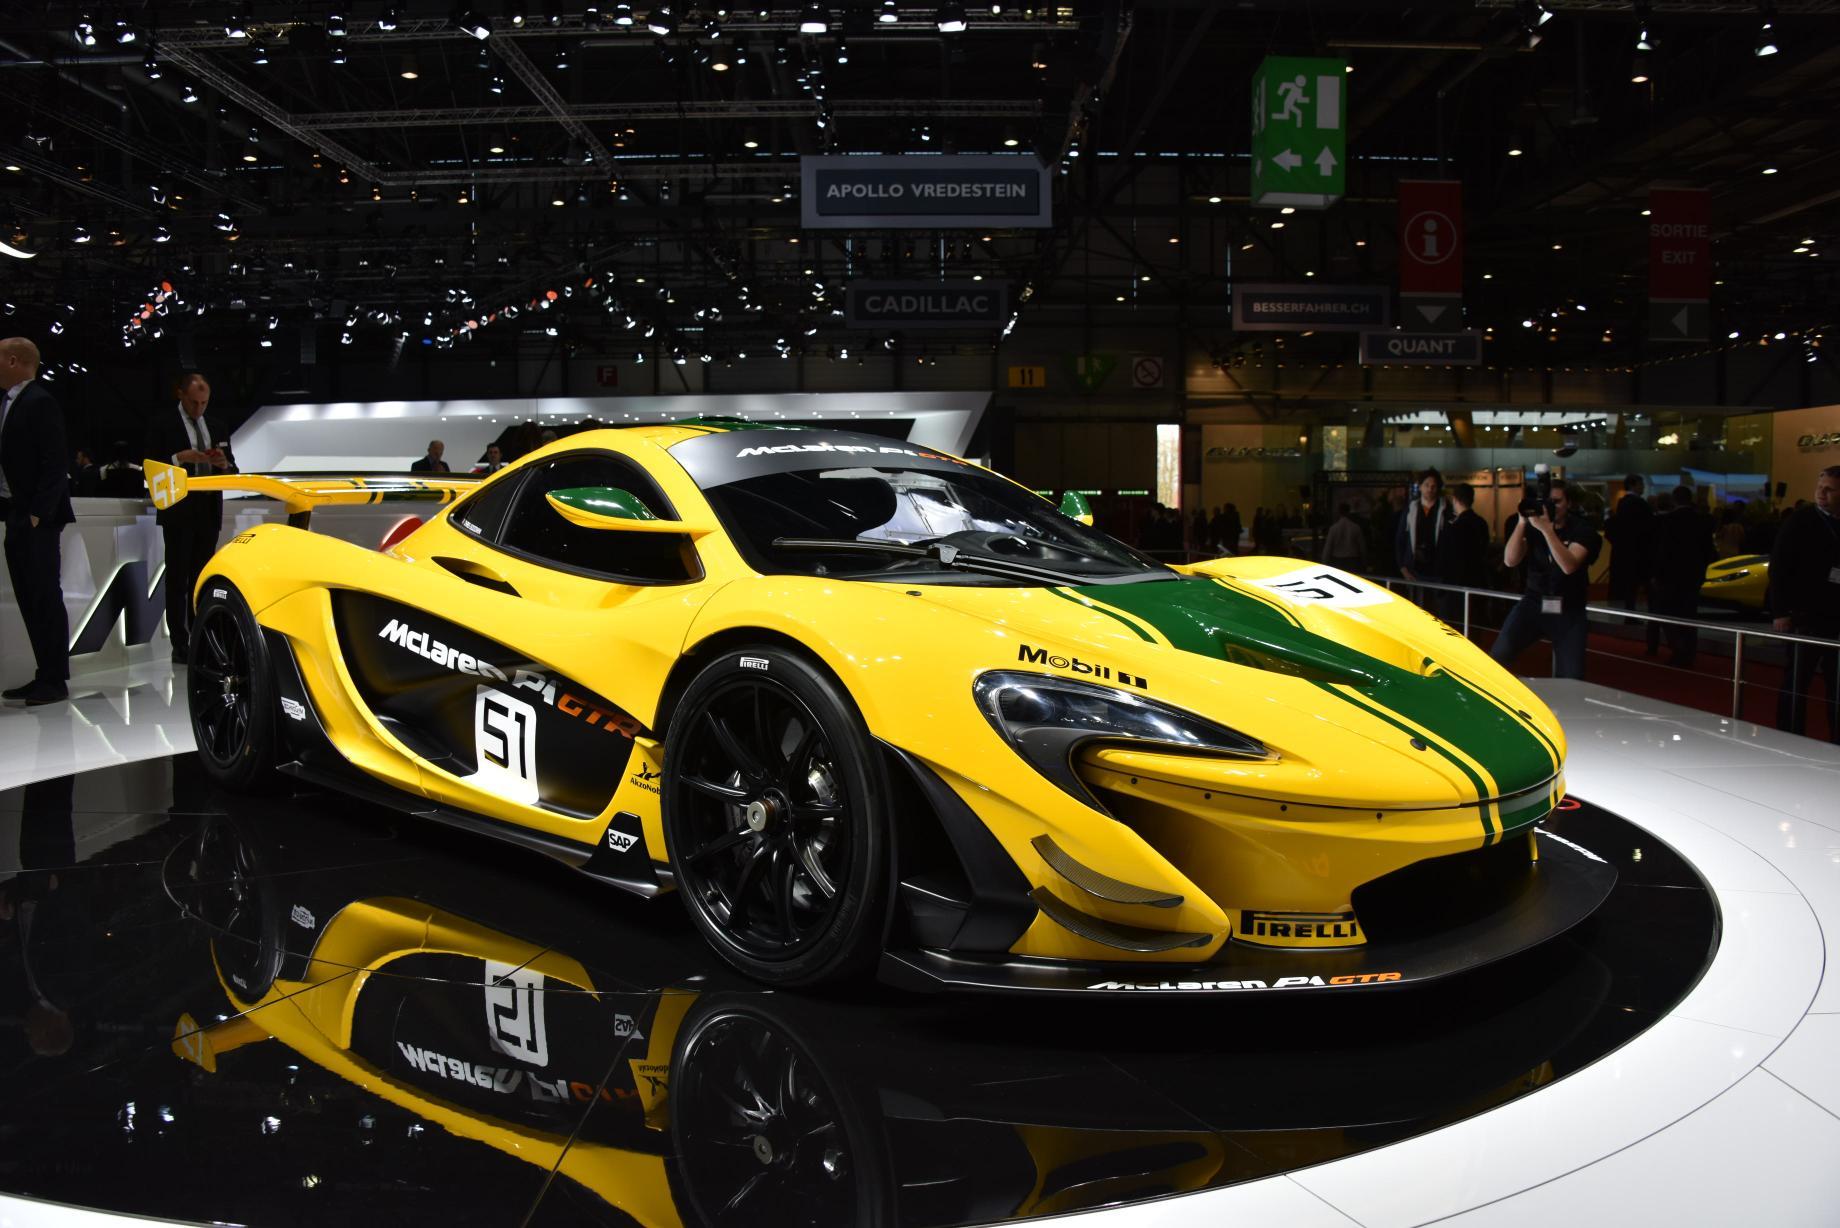 mclaren p1 gtr race car debuts at the geneva motor show 2015 autoevolution. Black Bedroom Furniture Sets. Home Design Ideas